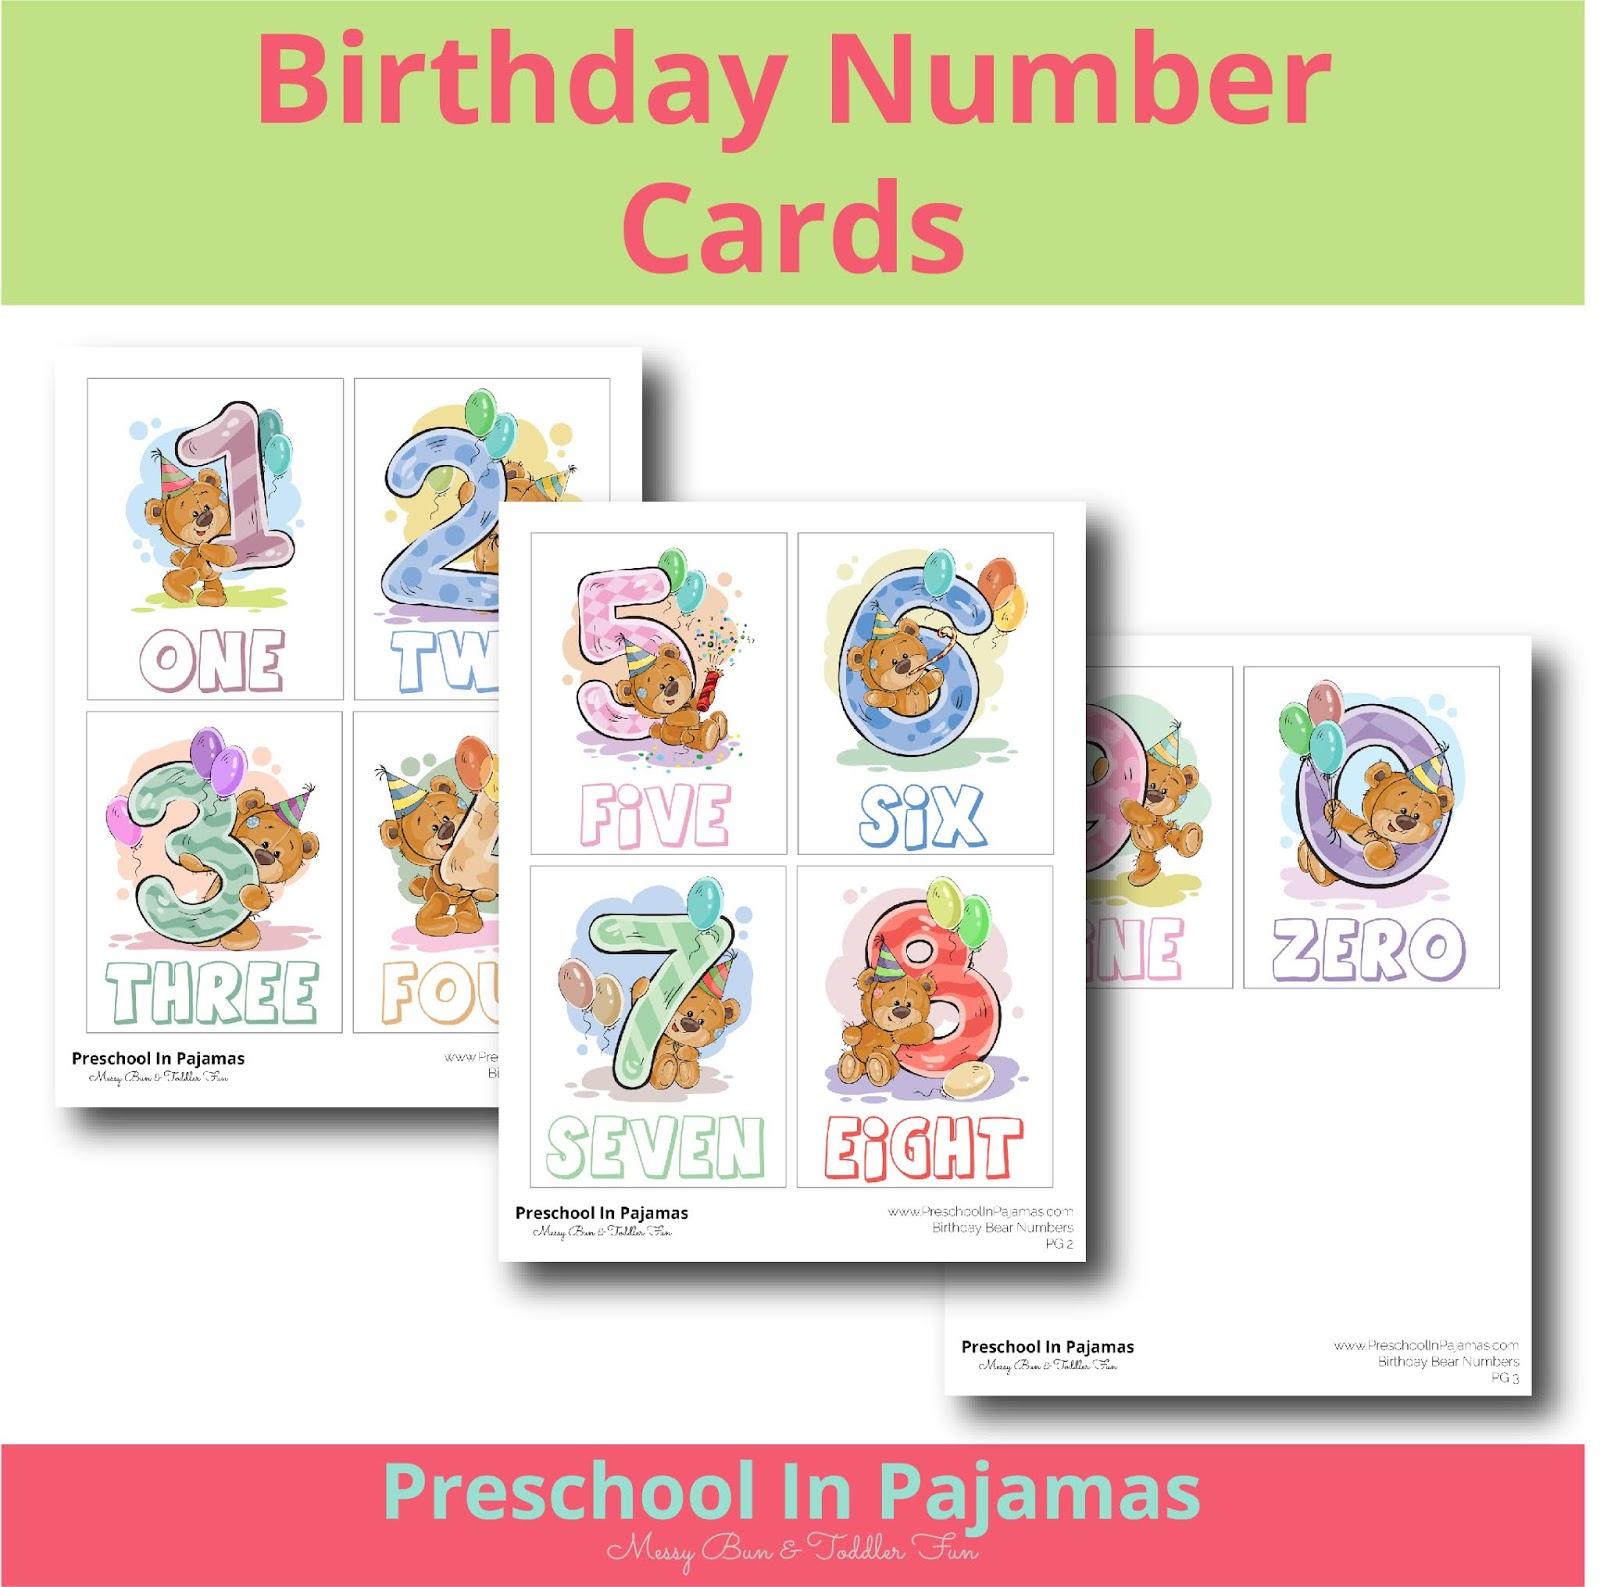 Free Birthday Number Cards Printable